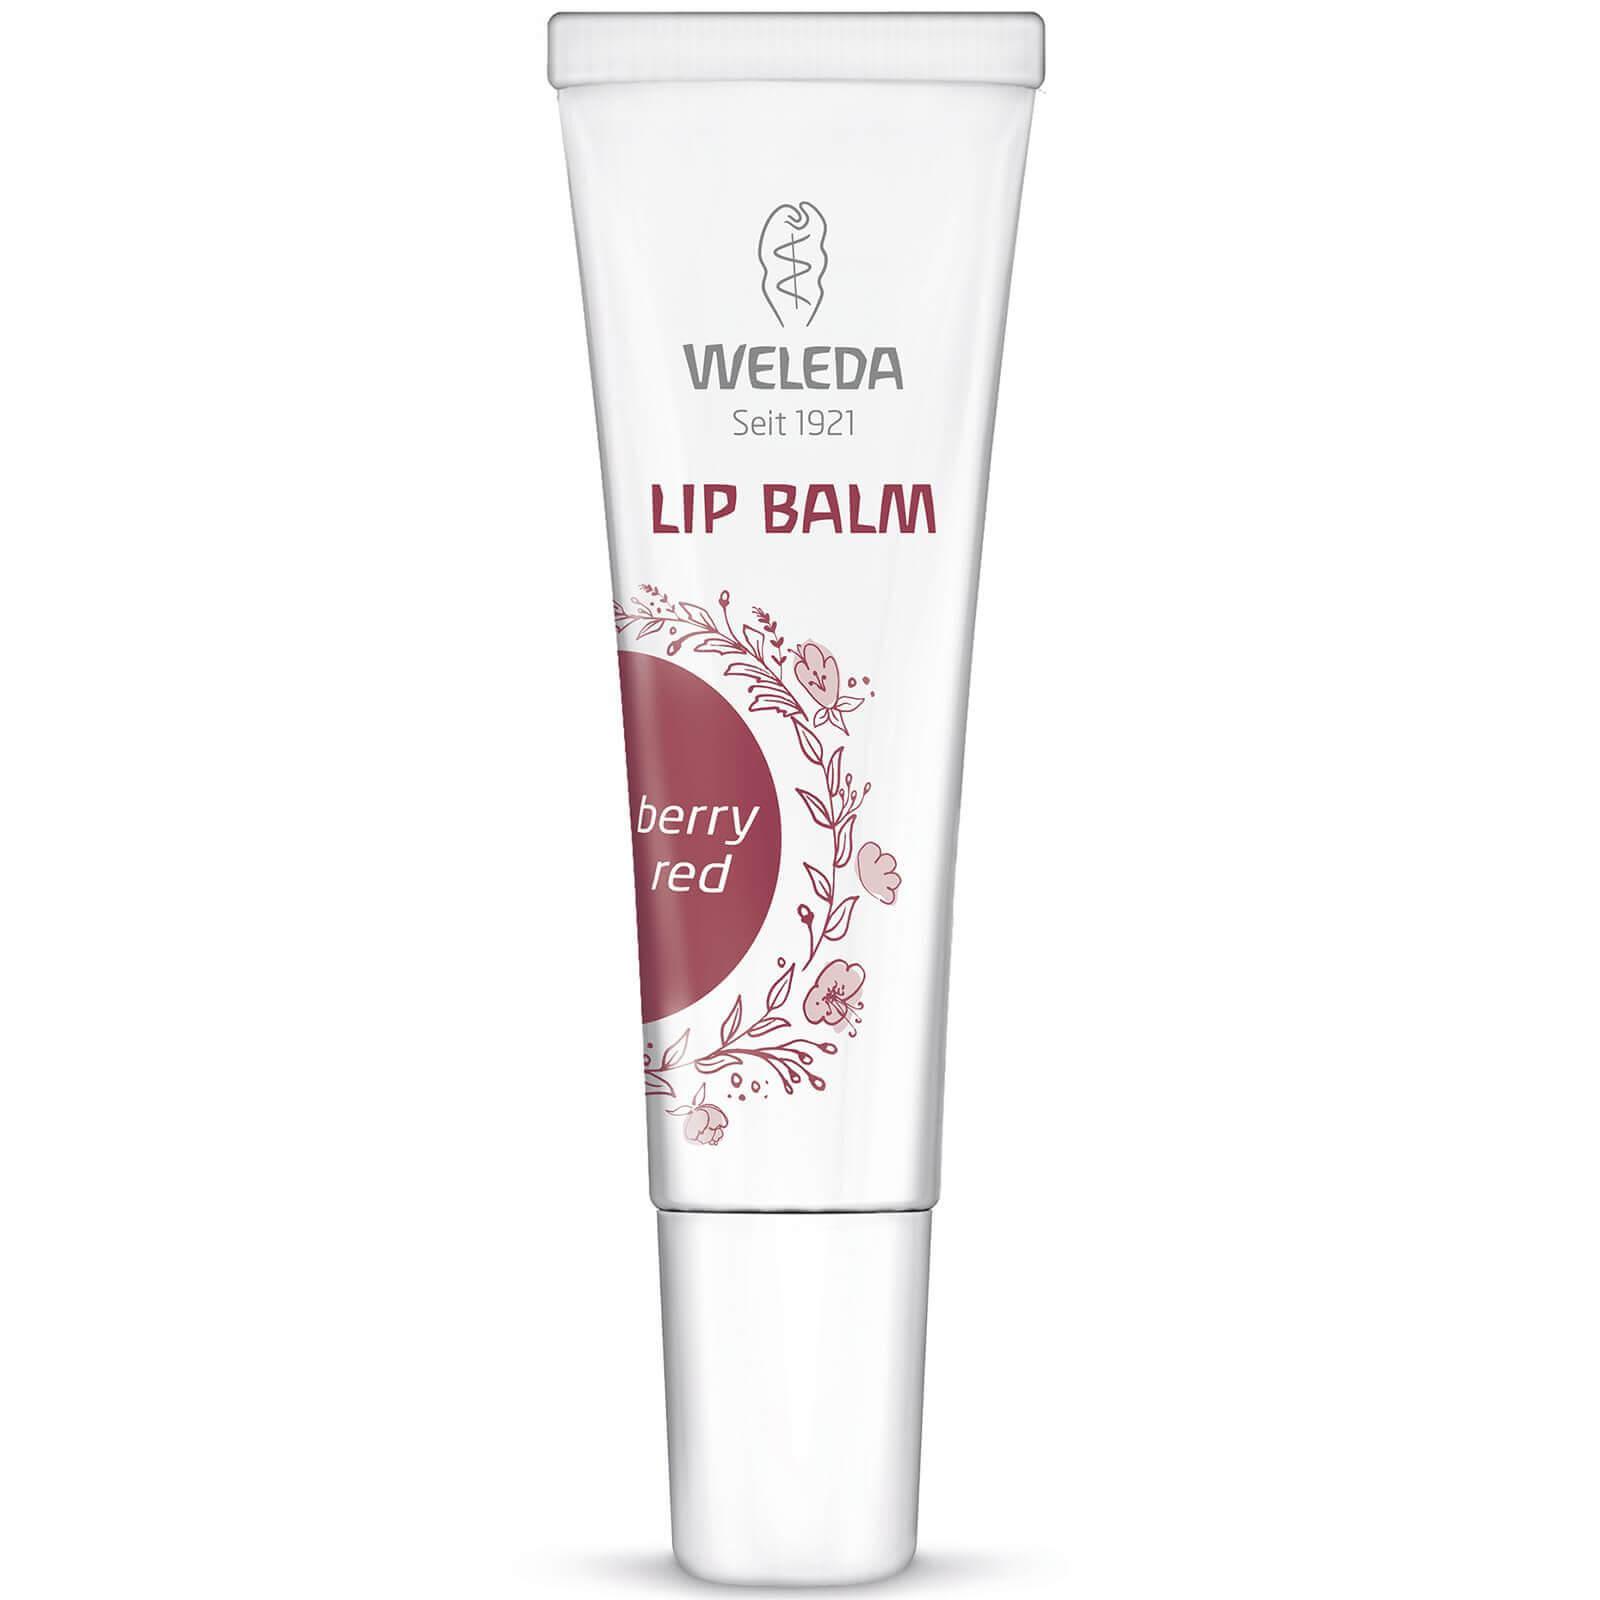 Weleda Lip Balm Berry Red Φυσική Περιποίηση με Διακριτικό Χρώμα Φρούτων του Δάσους 10ml